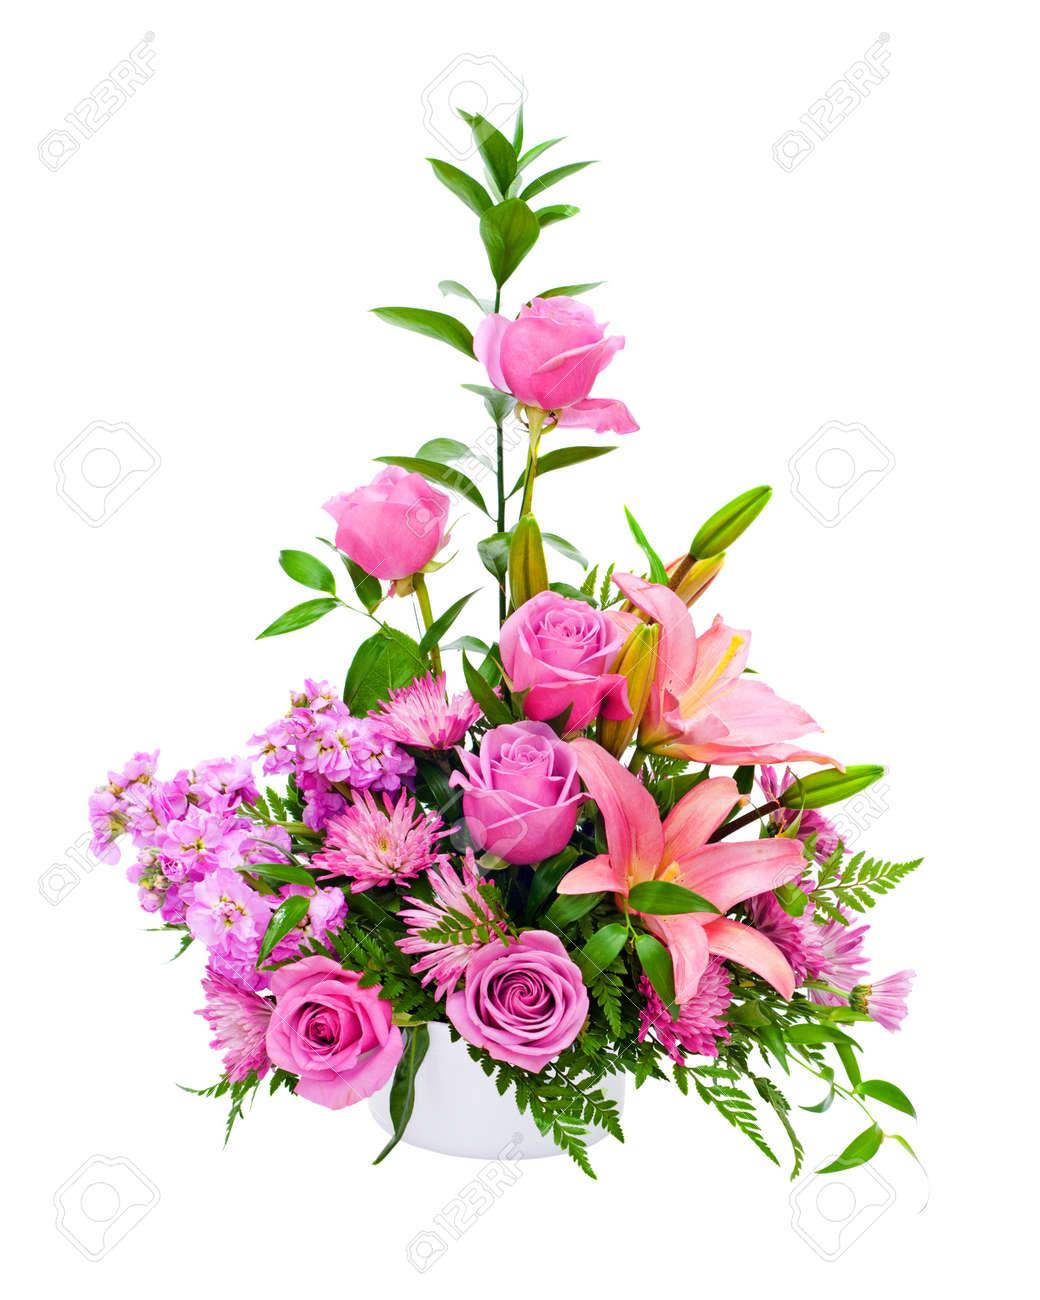 Colorido Arreglo Floral Central Púrpura Con Rosas Lirios Claveles Aislado En Blanco